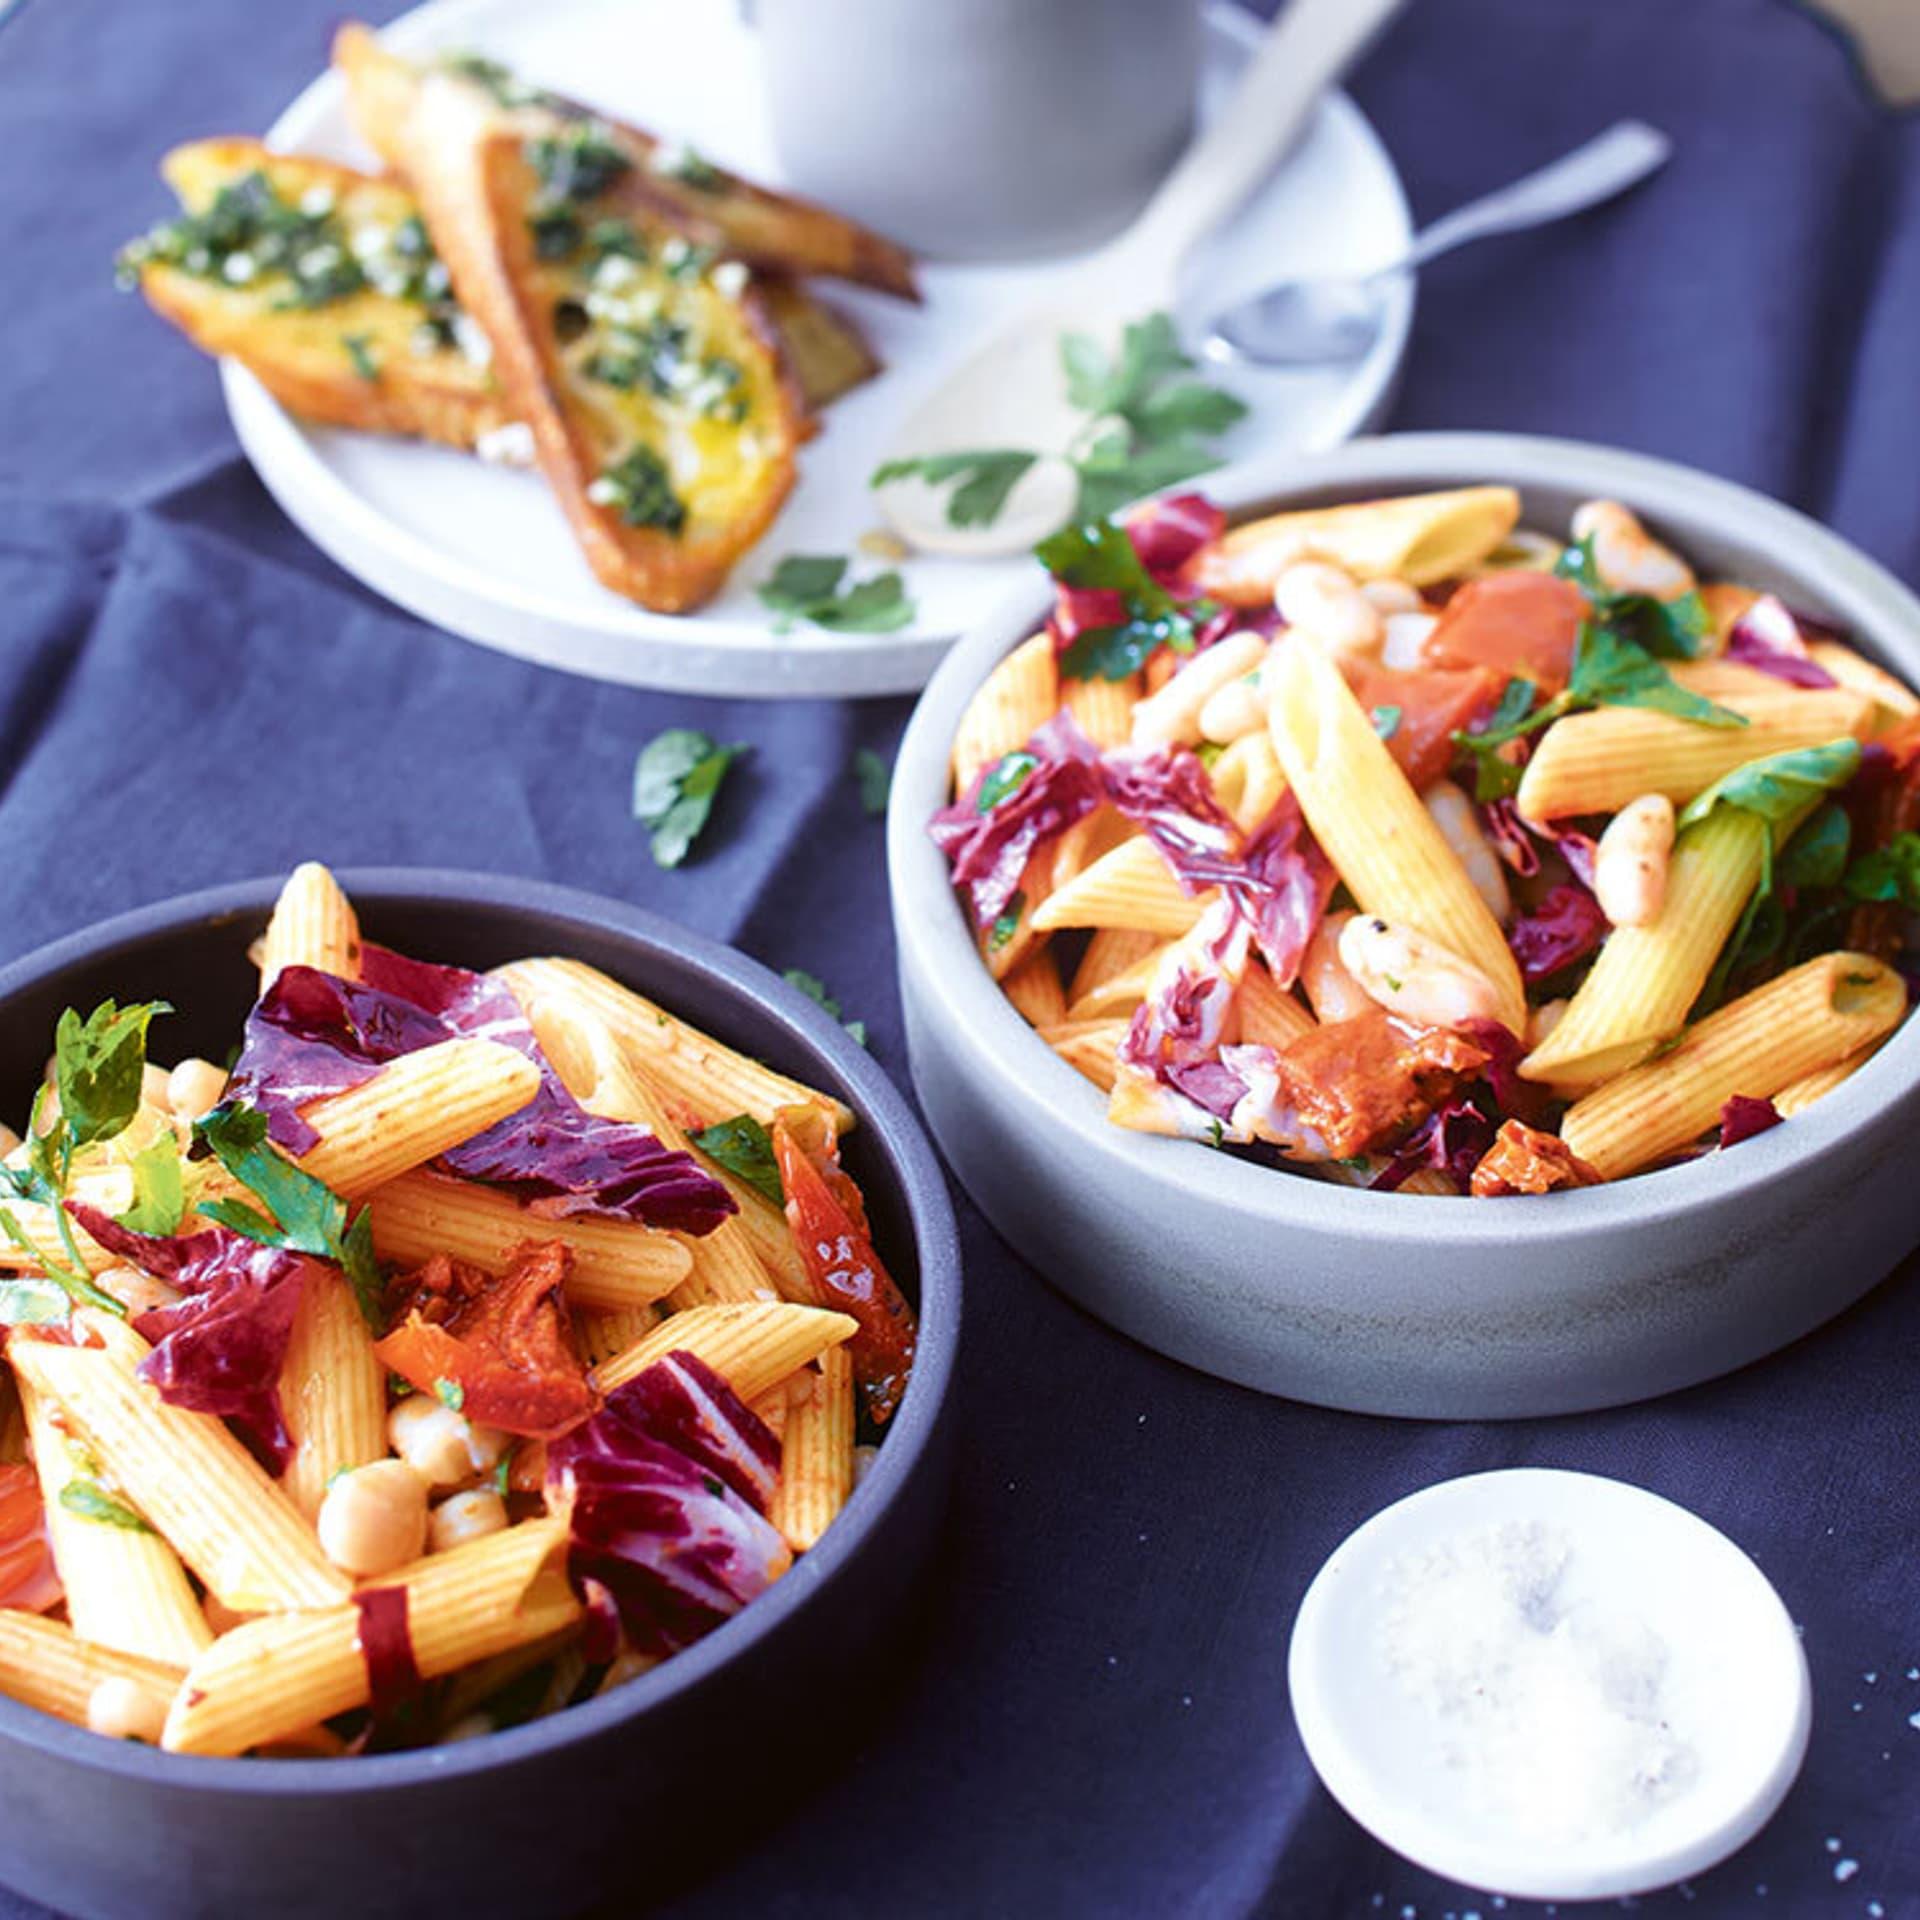 Nudel-Radicchio-Salat